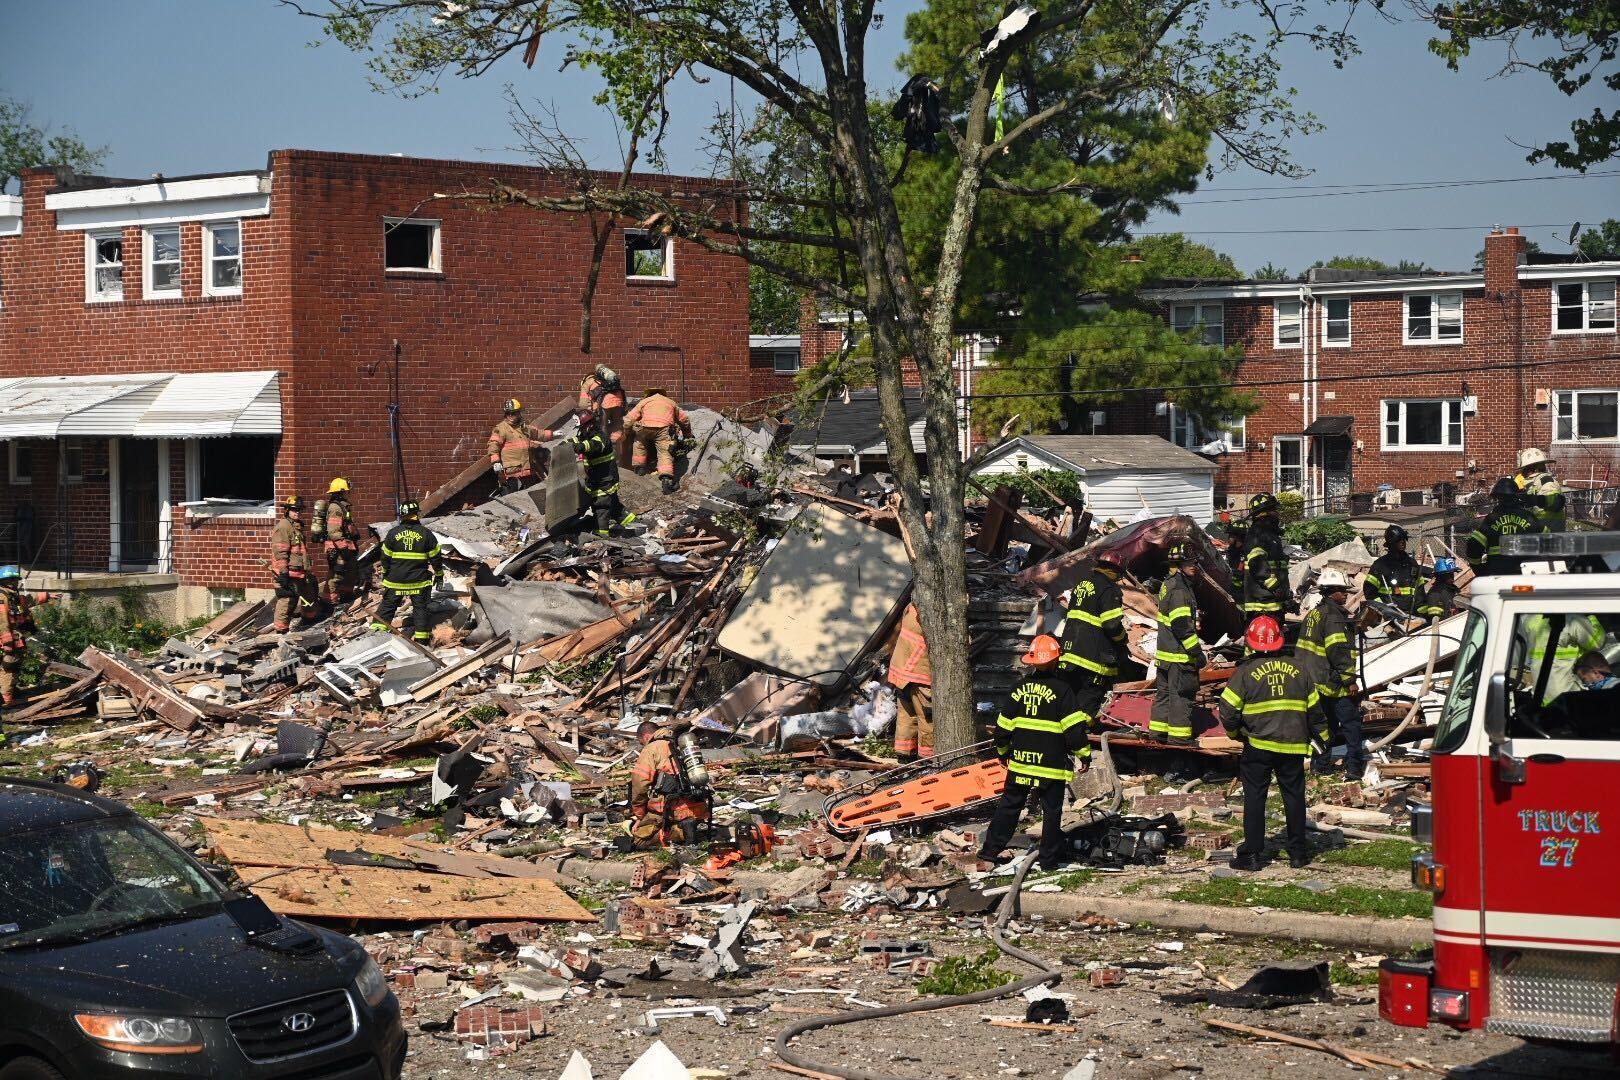 baltimore explosion - photo #12